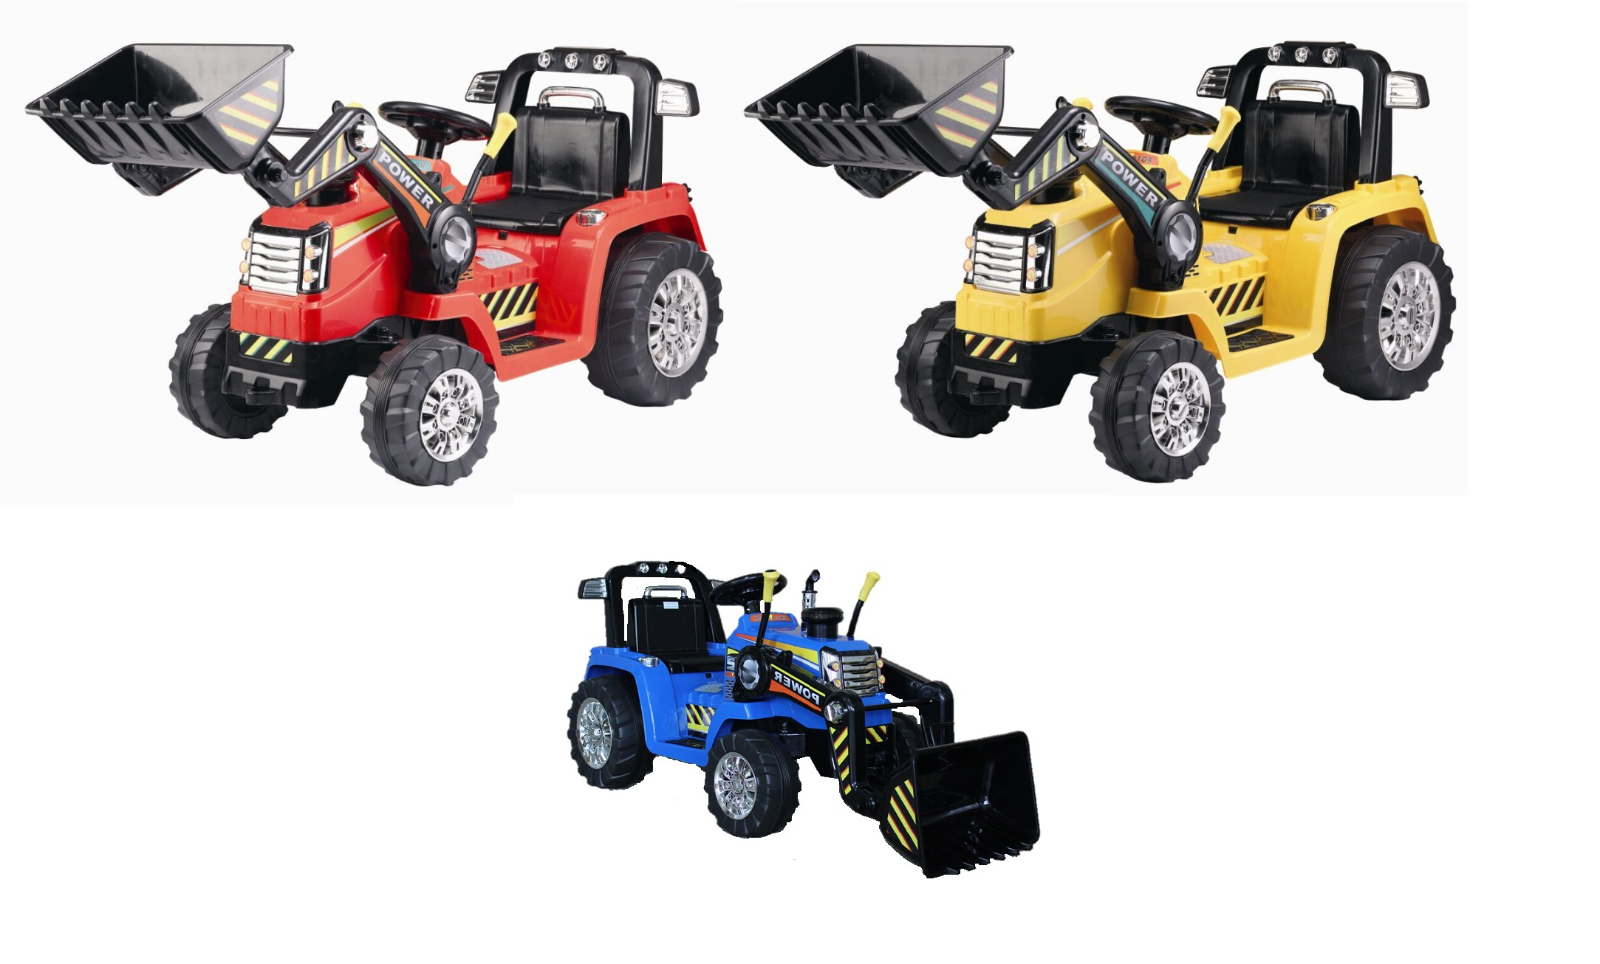 RC Schlepper Traktor - Bagger Kinder elektro traktor 2 MOTOREN FERNBEDIENUNG NEU